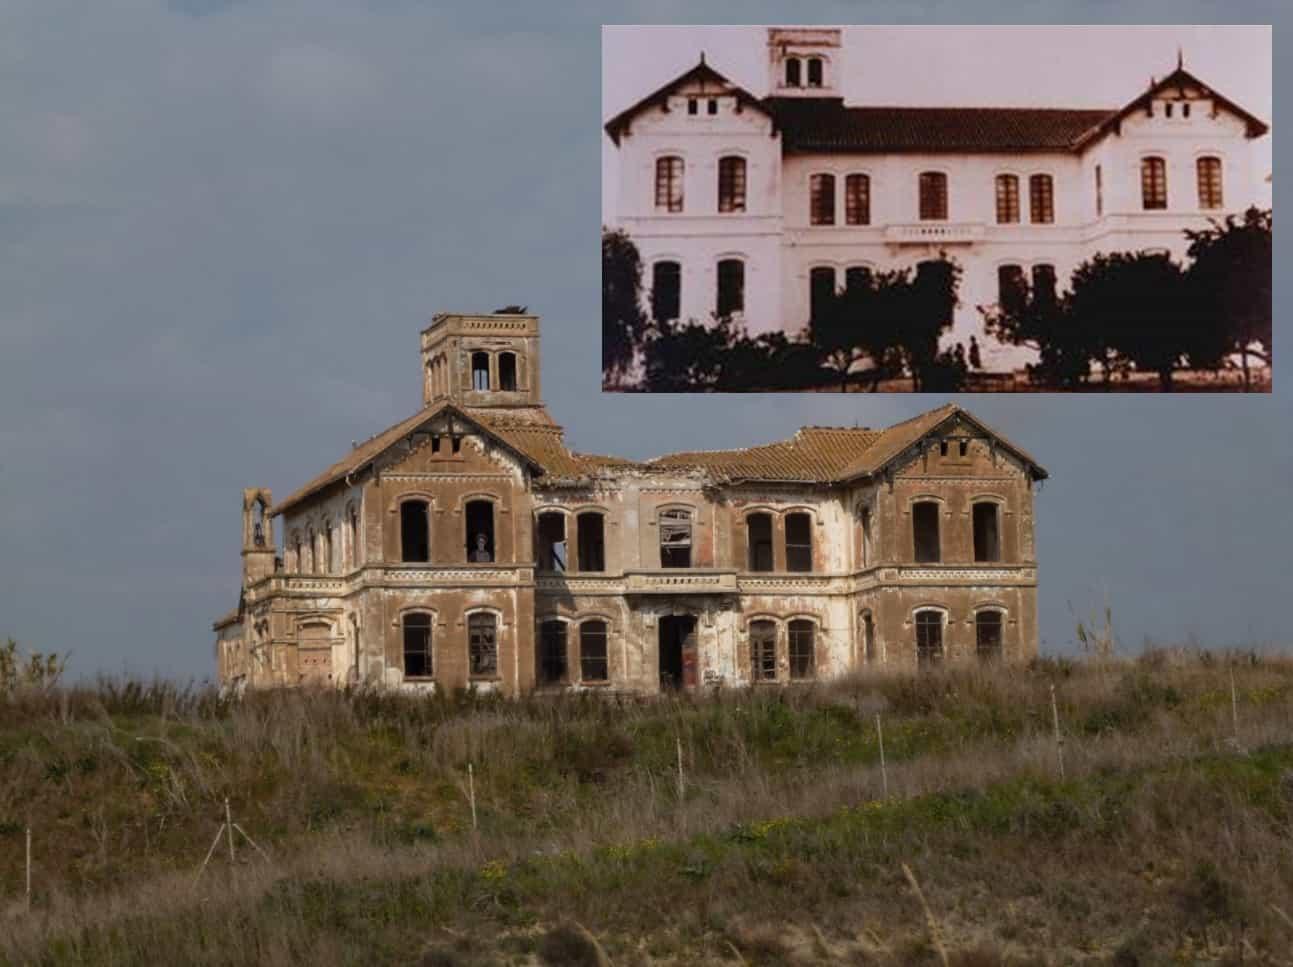 Before and after of Cortijo Jurado